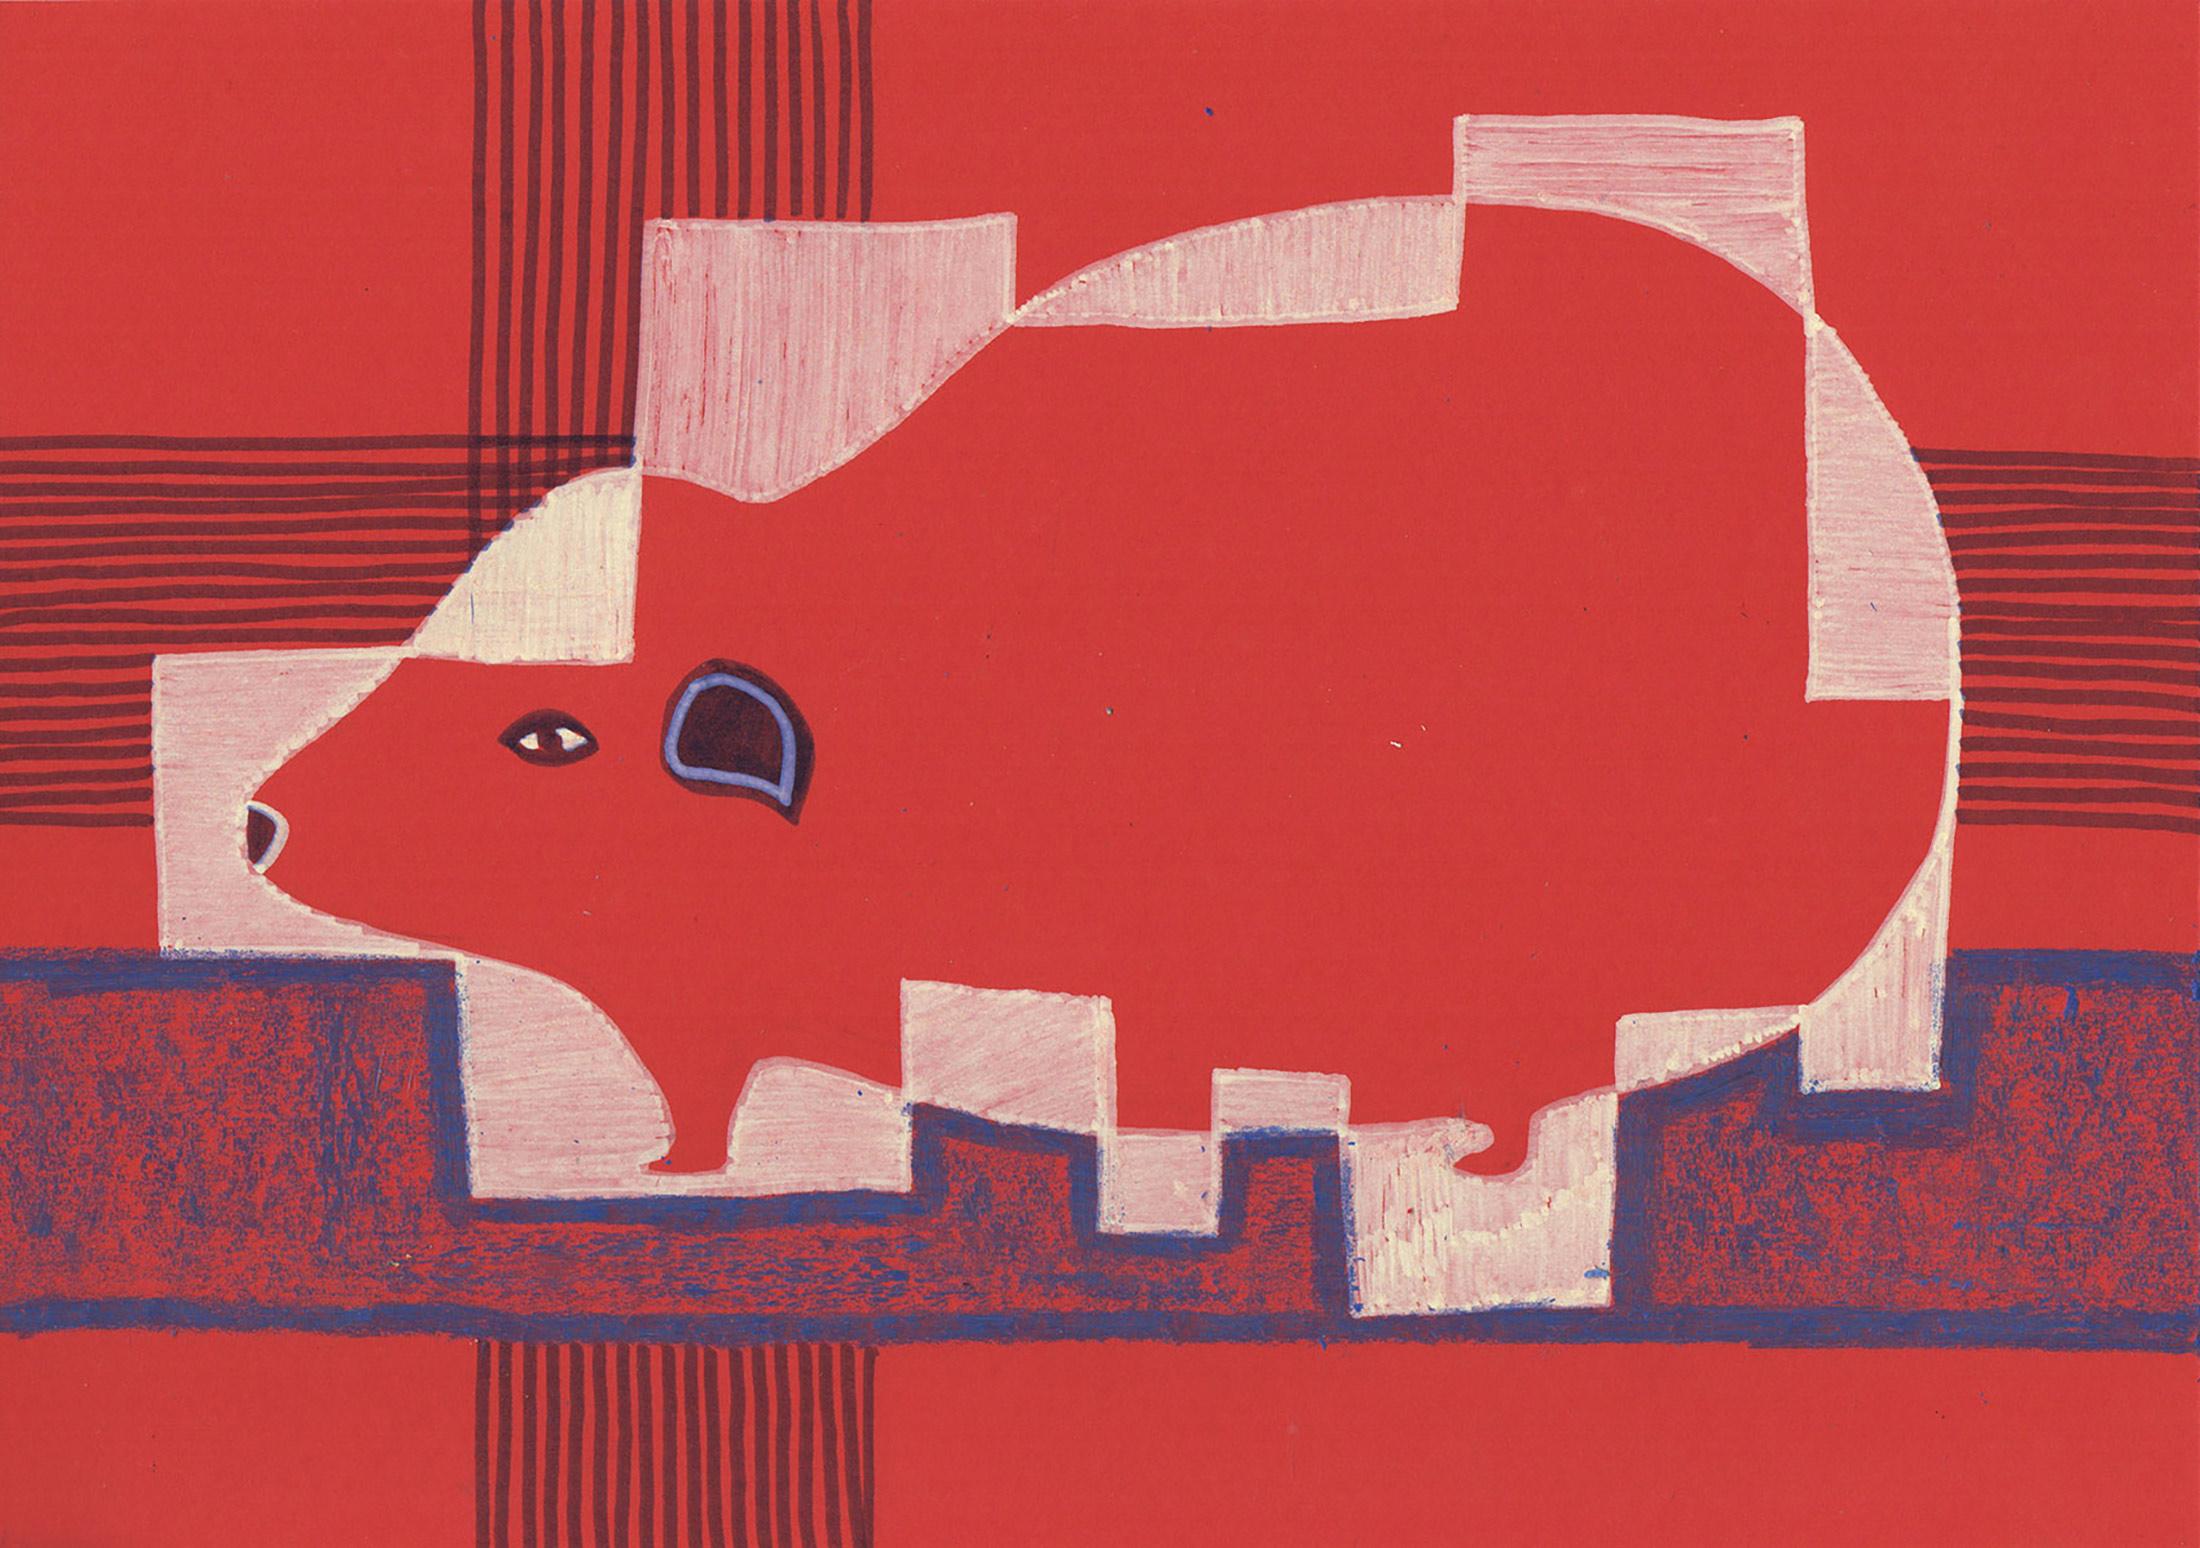 alexandra feusi, mixed media, collage, semi-cardboard, contemporary art, fine arts student